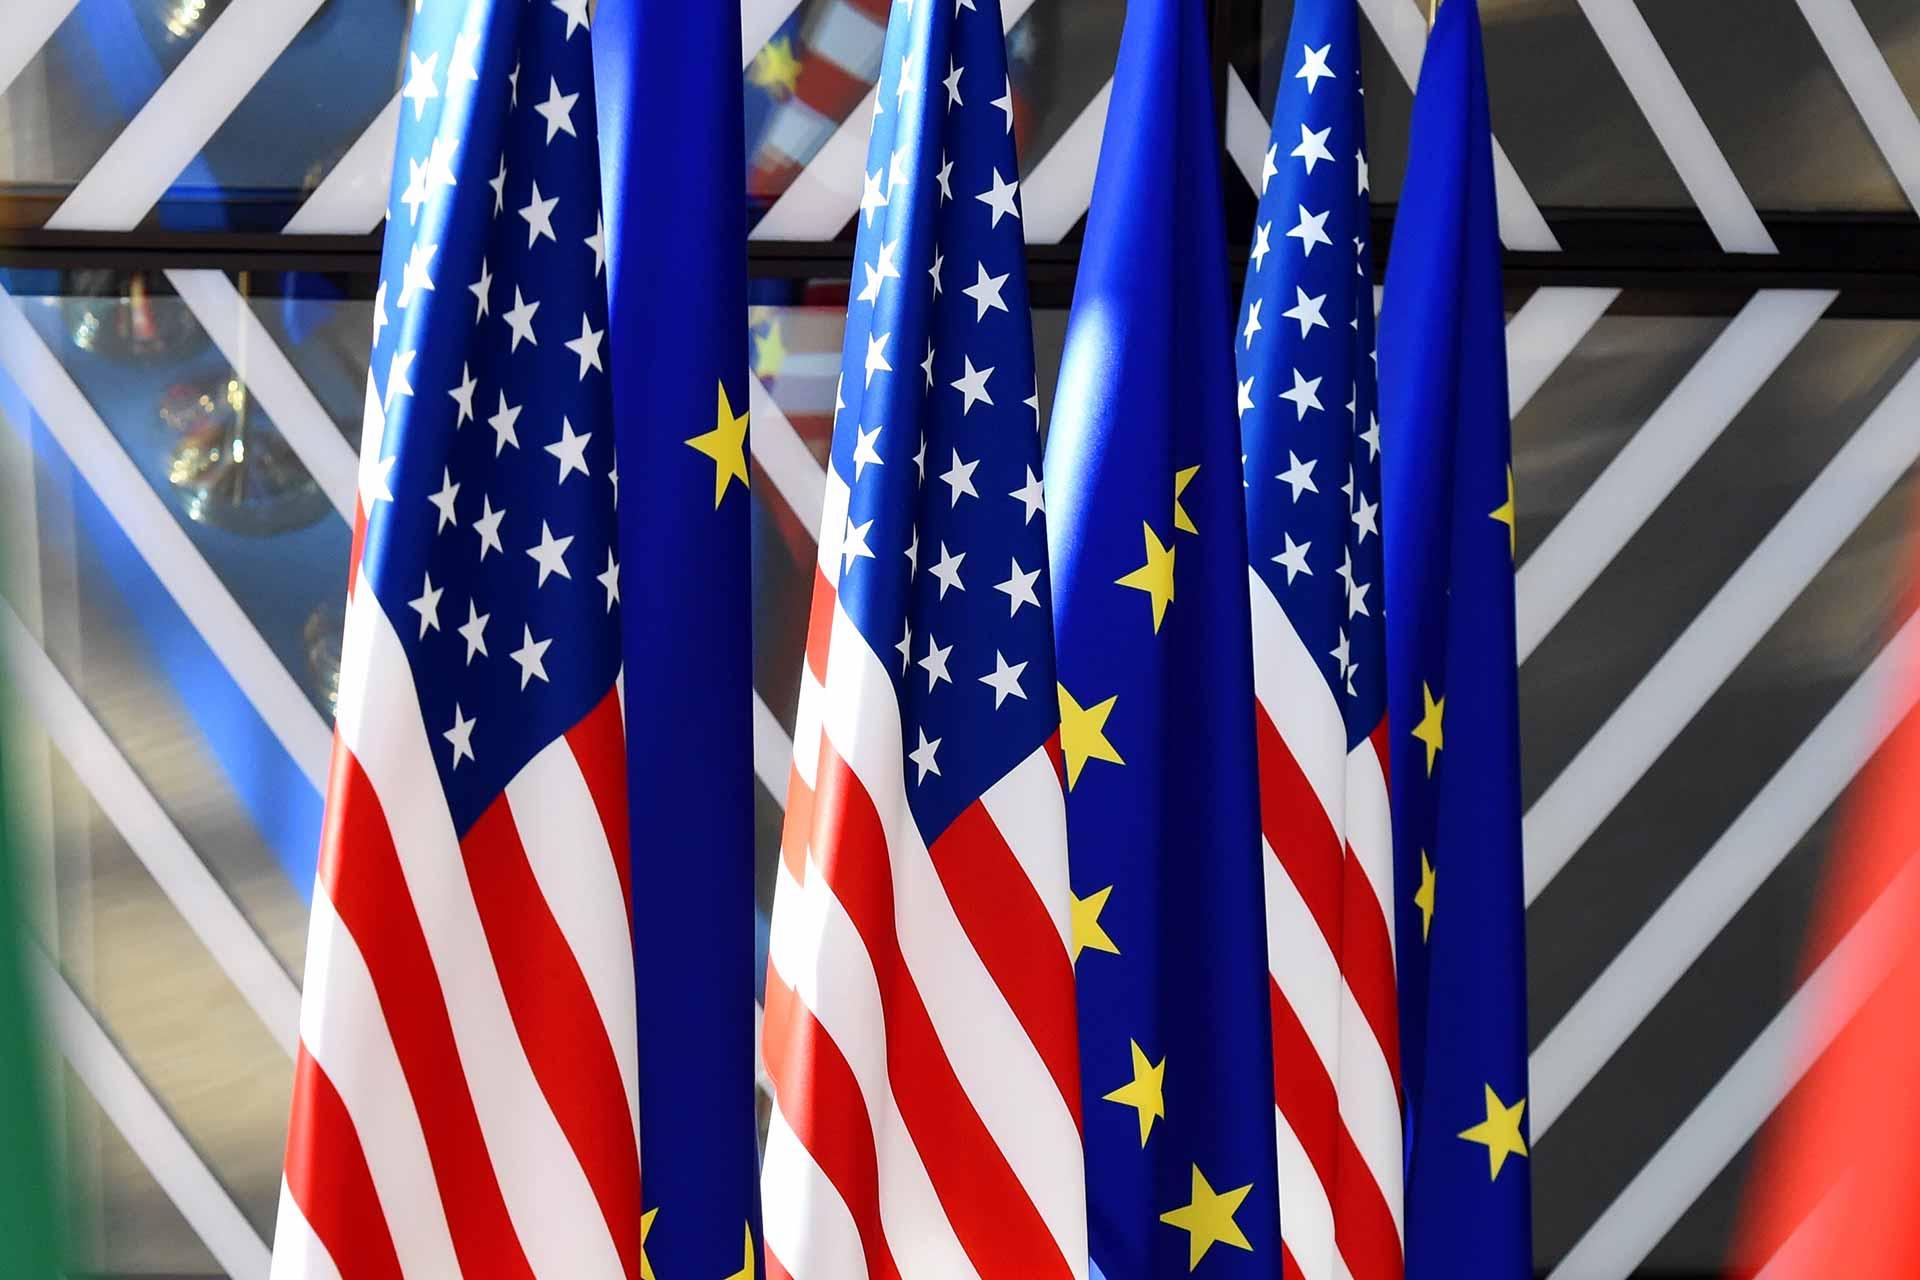 EU USA flags at the EUropean Council